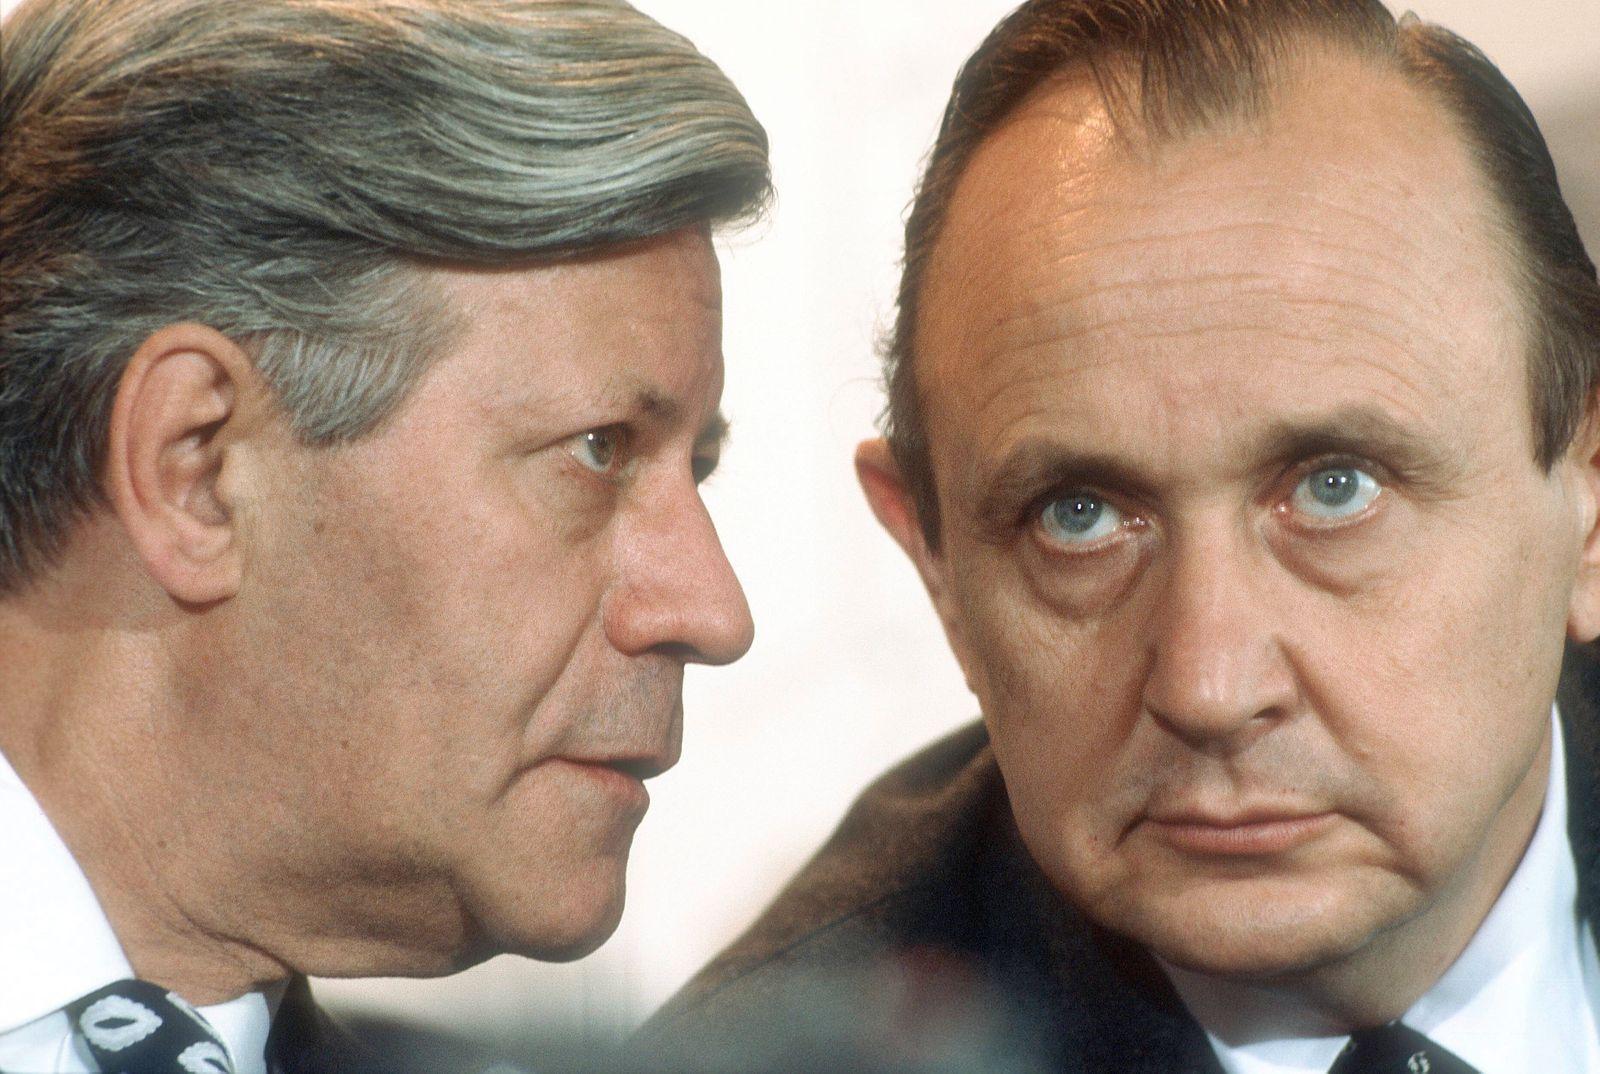 Bundesaussenminister Hans-Dietrich GENSCHER (r), FDP, und Bundeskanzler Helmut SCHMIDT , SPD. Bonn , 1977 , , Bonn Deut